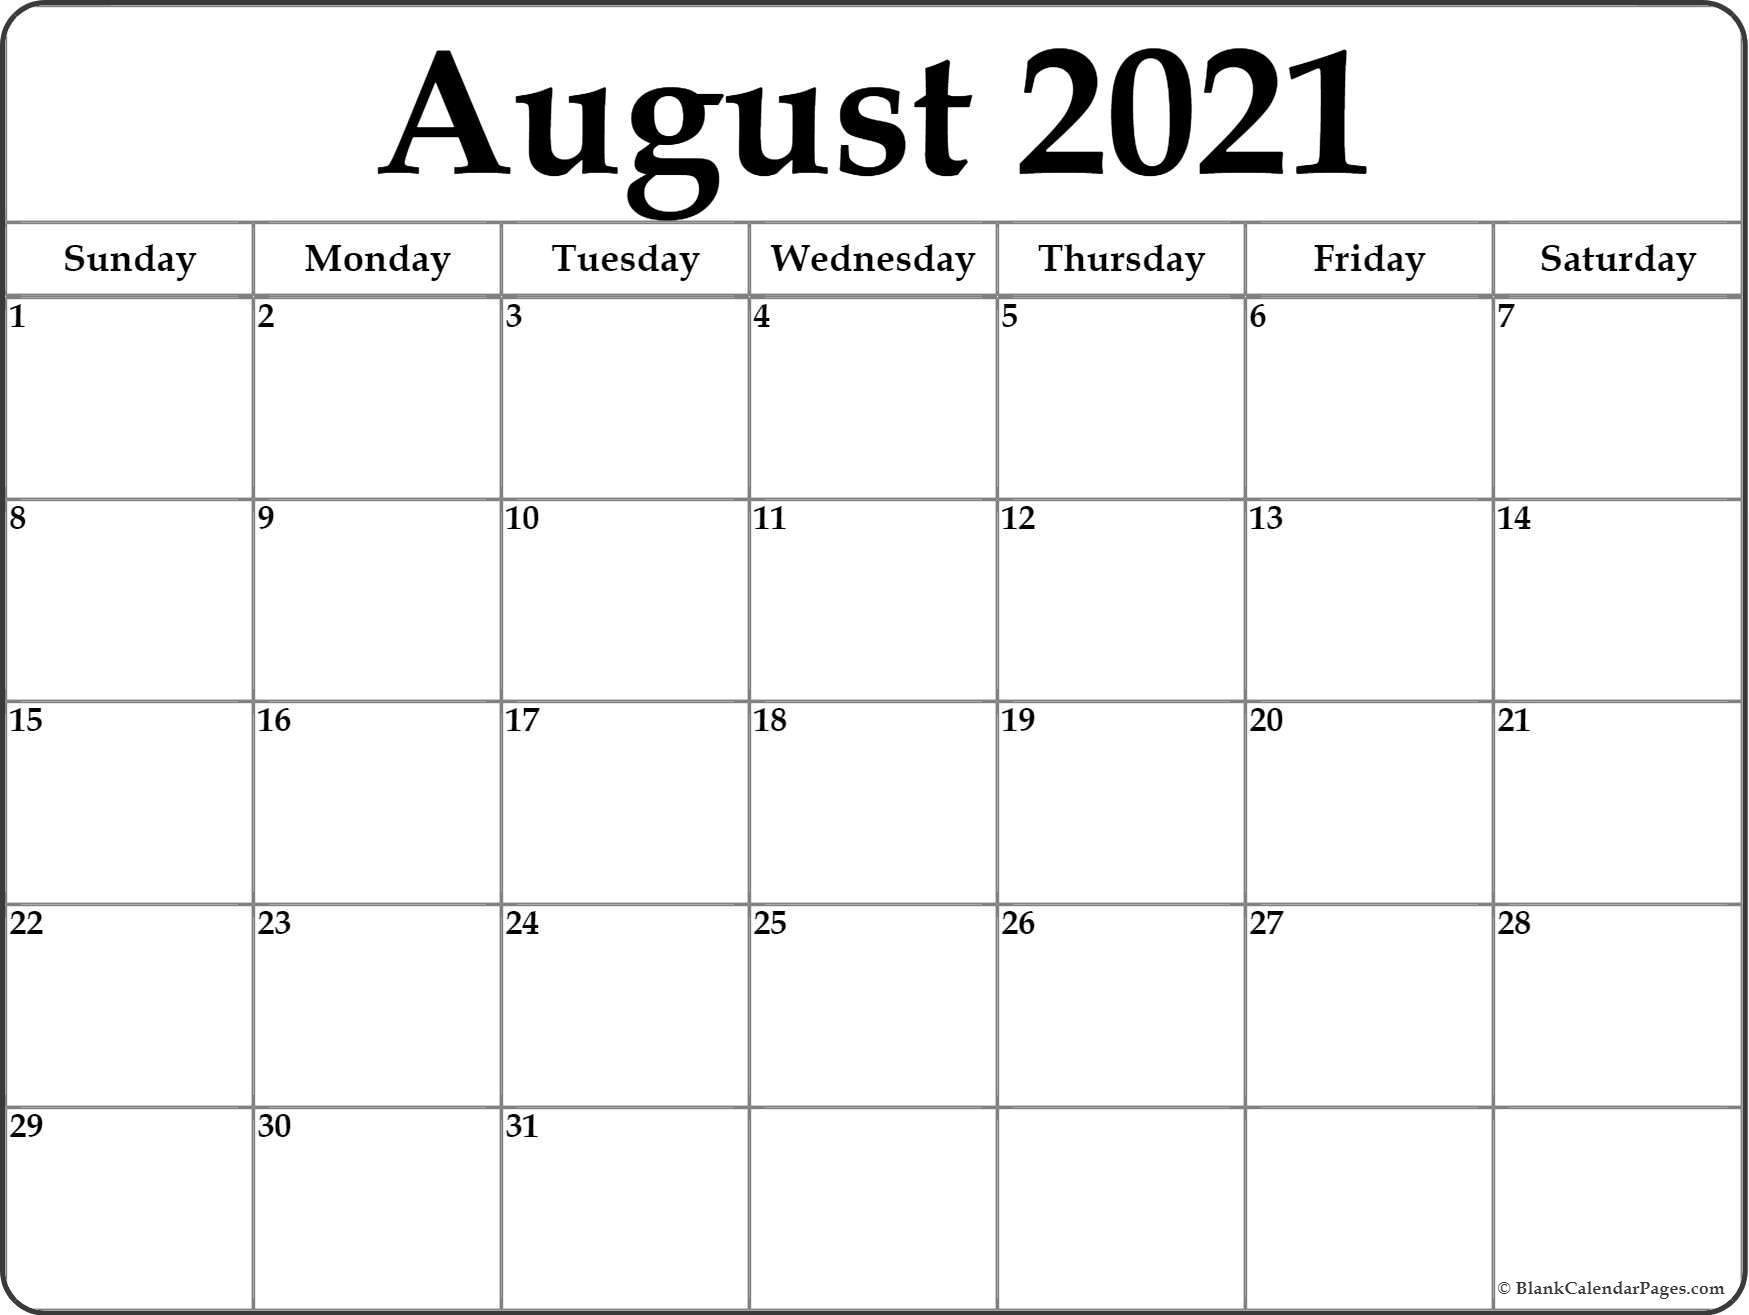 Get August 2021 Calendar Printable Template